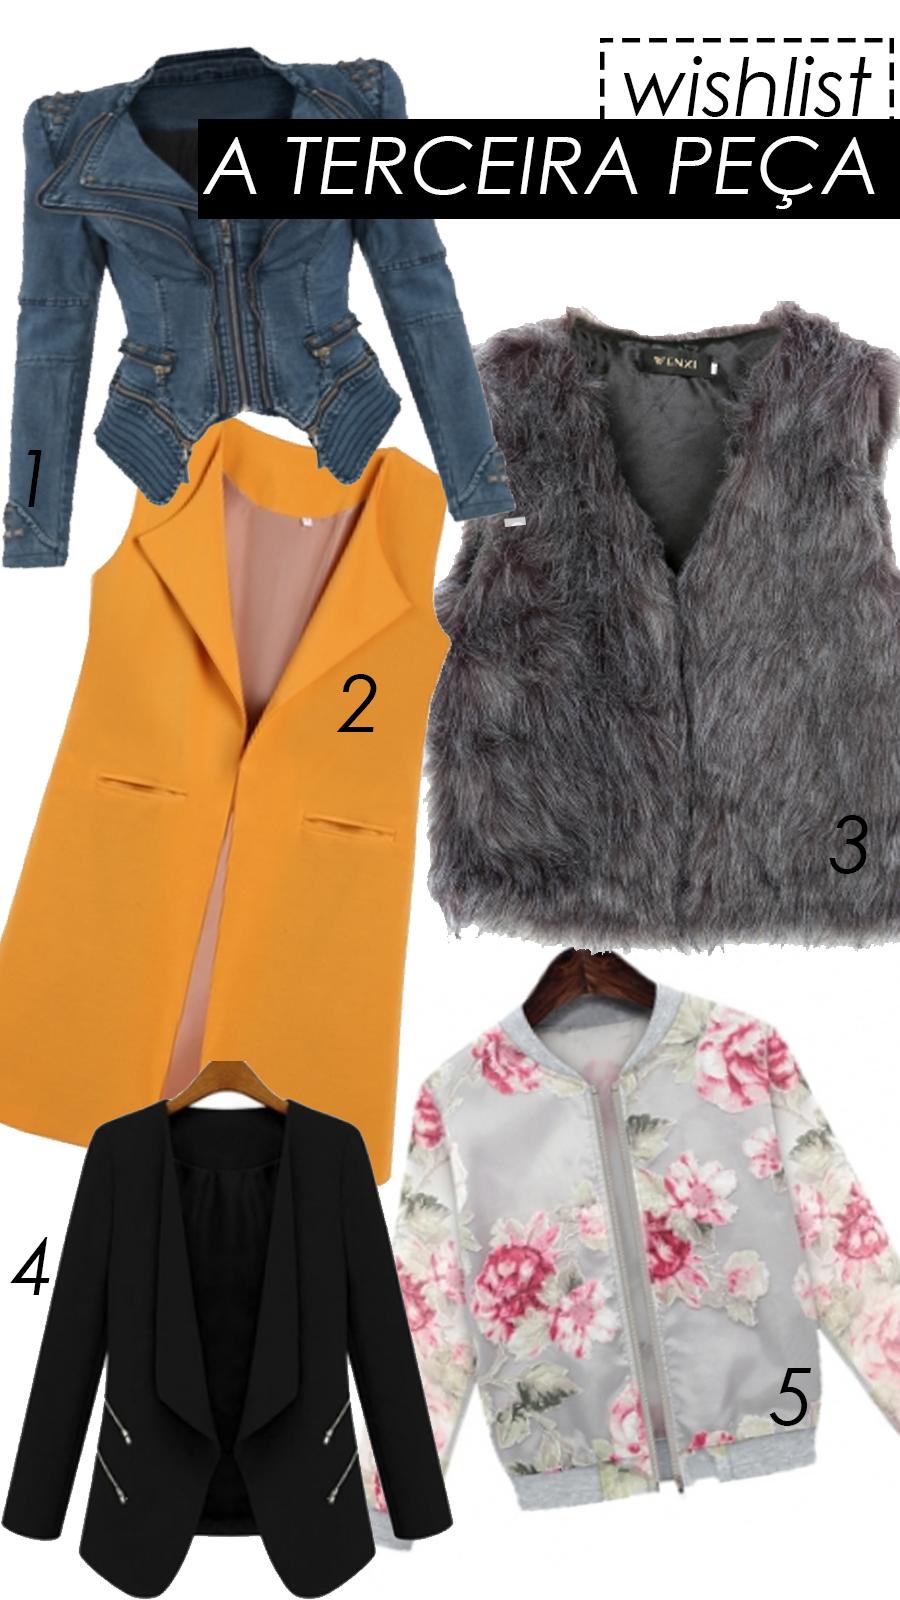 a-terceira-peça-do-look-onde-comprar-blog-ursula-pink-woman